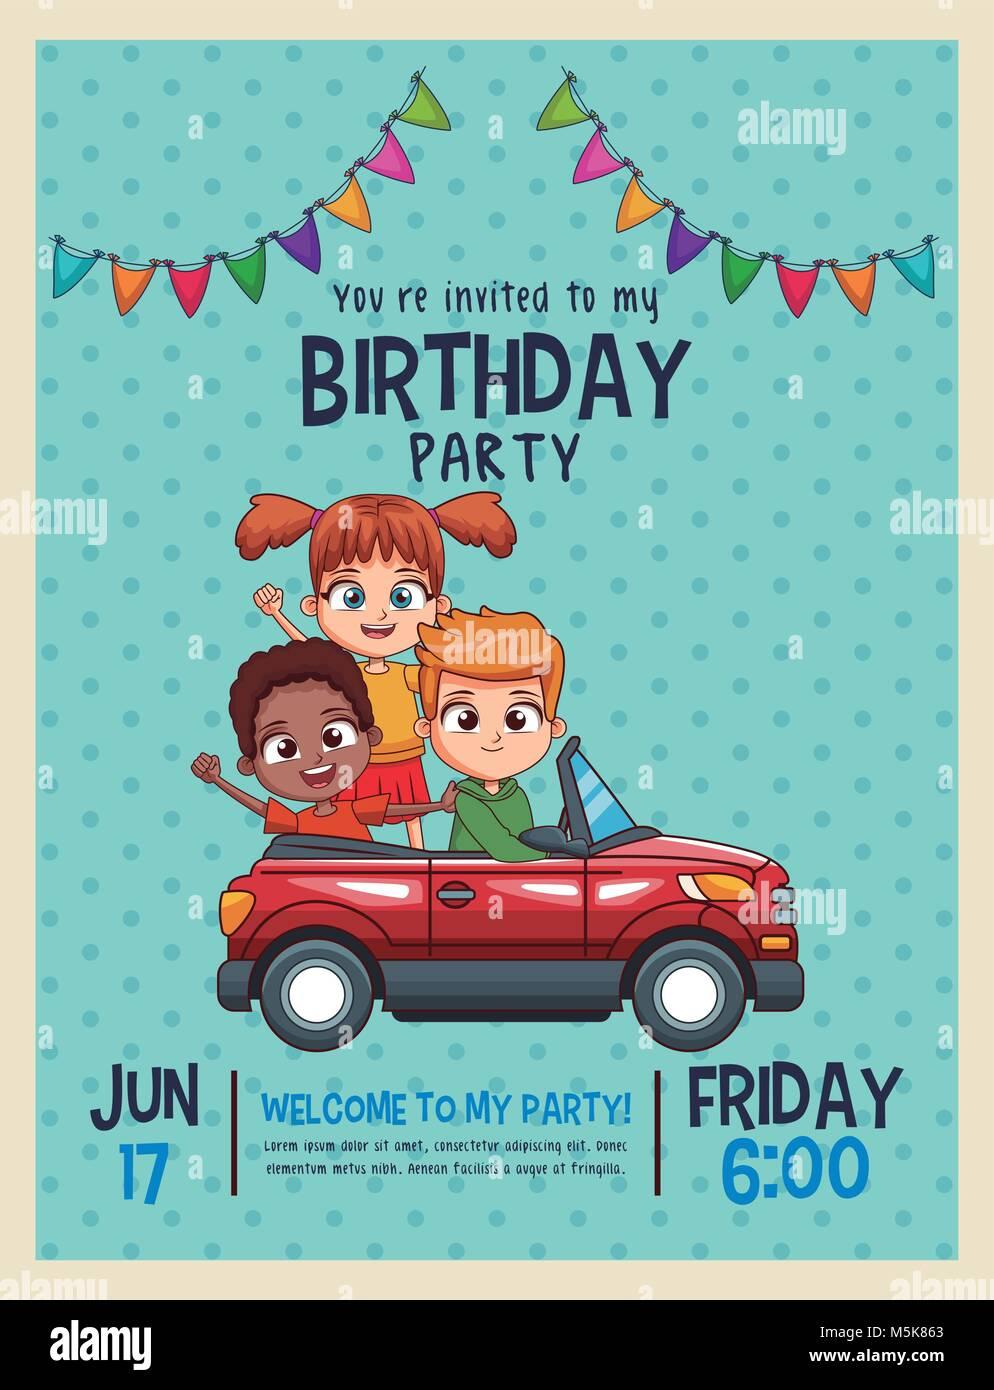 Kids birthday invitation card stock vector art illustration kids birthday invitation card stopboris Choice Image